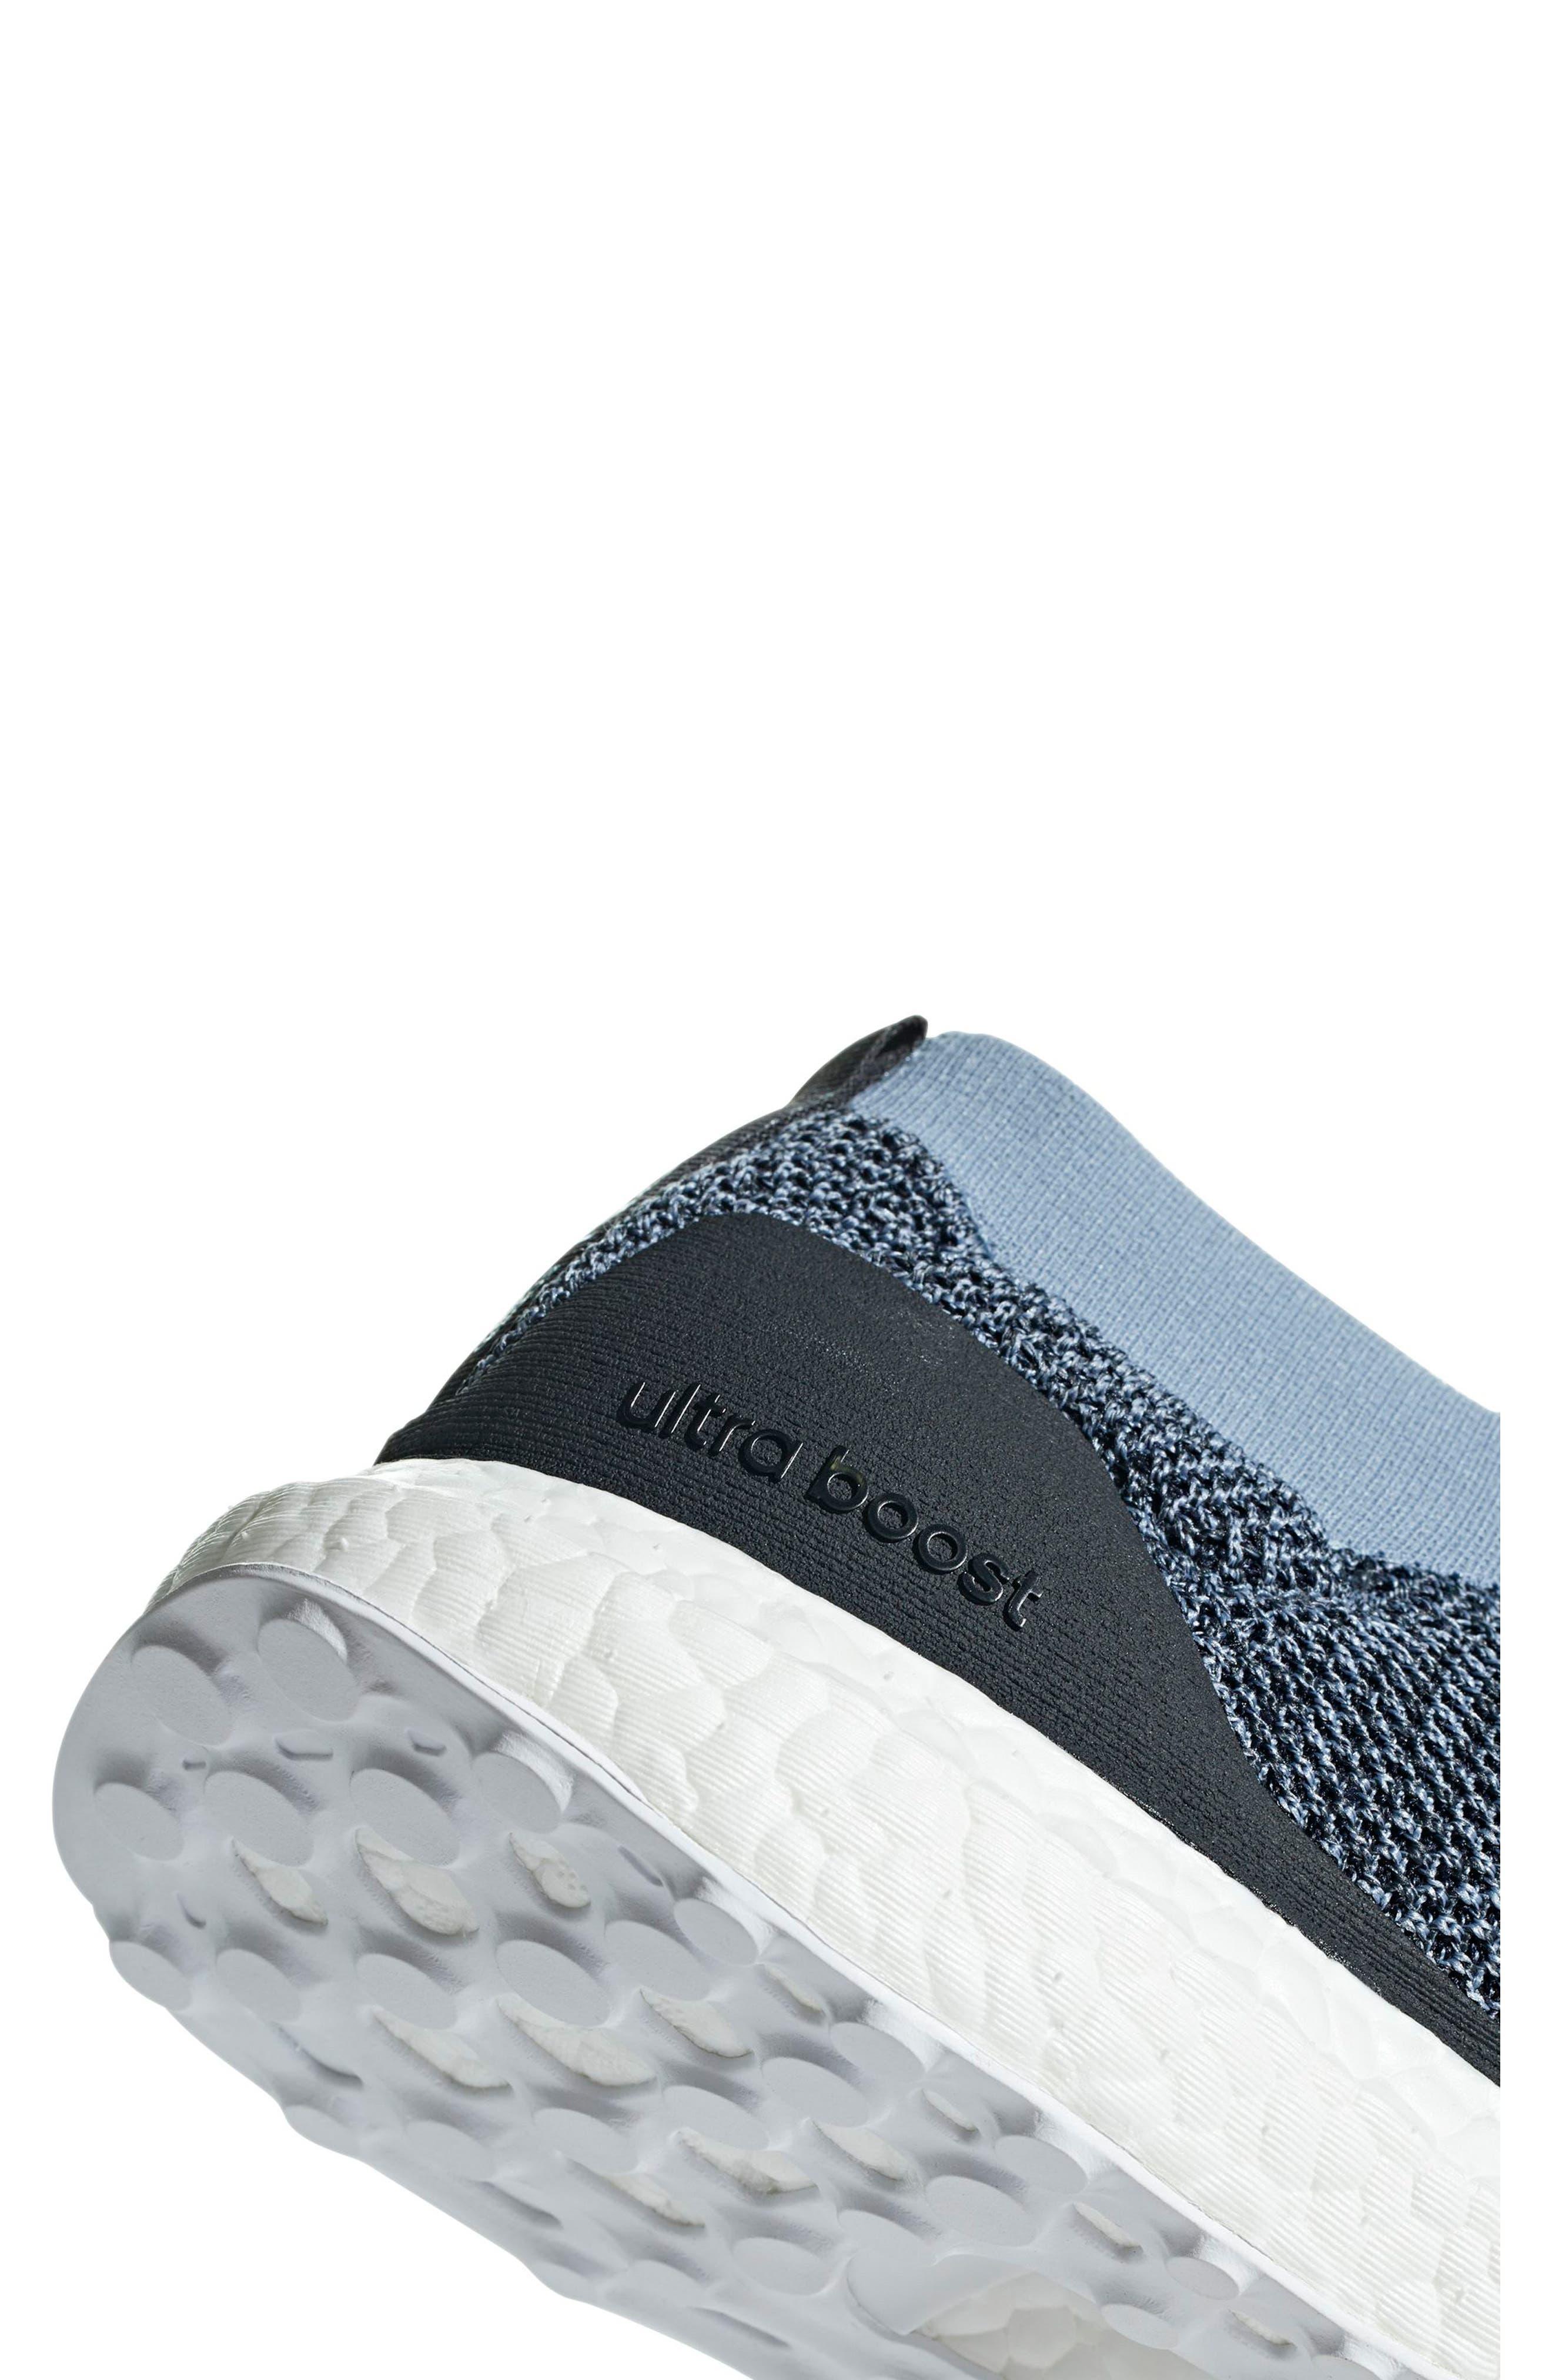 UltraBoost Laceless Running Shoe,                             Alternate thumbnail 5, color,                             060